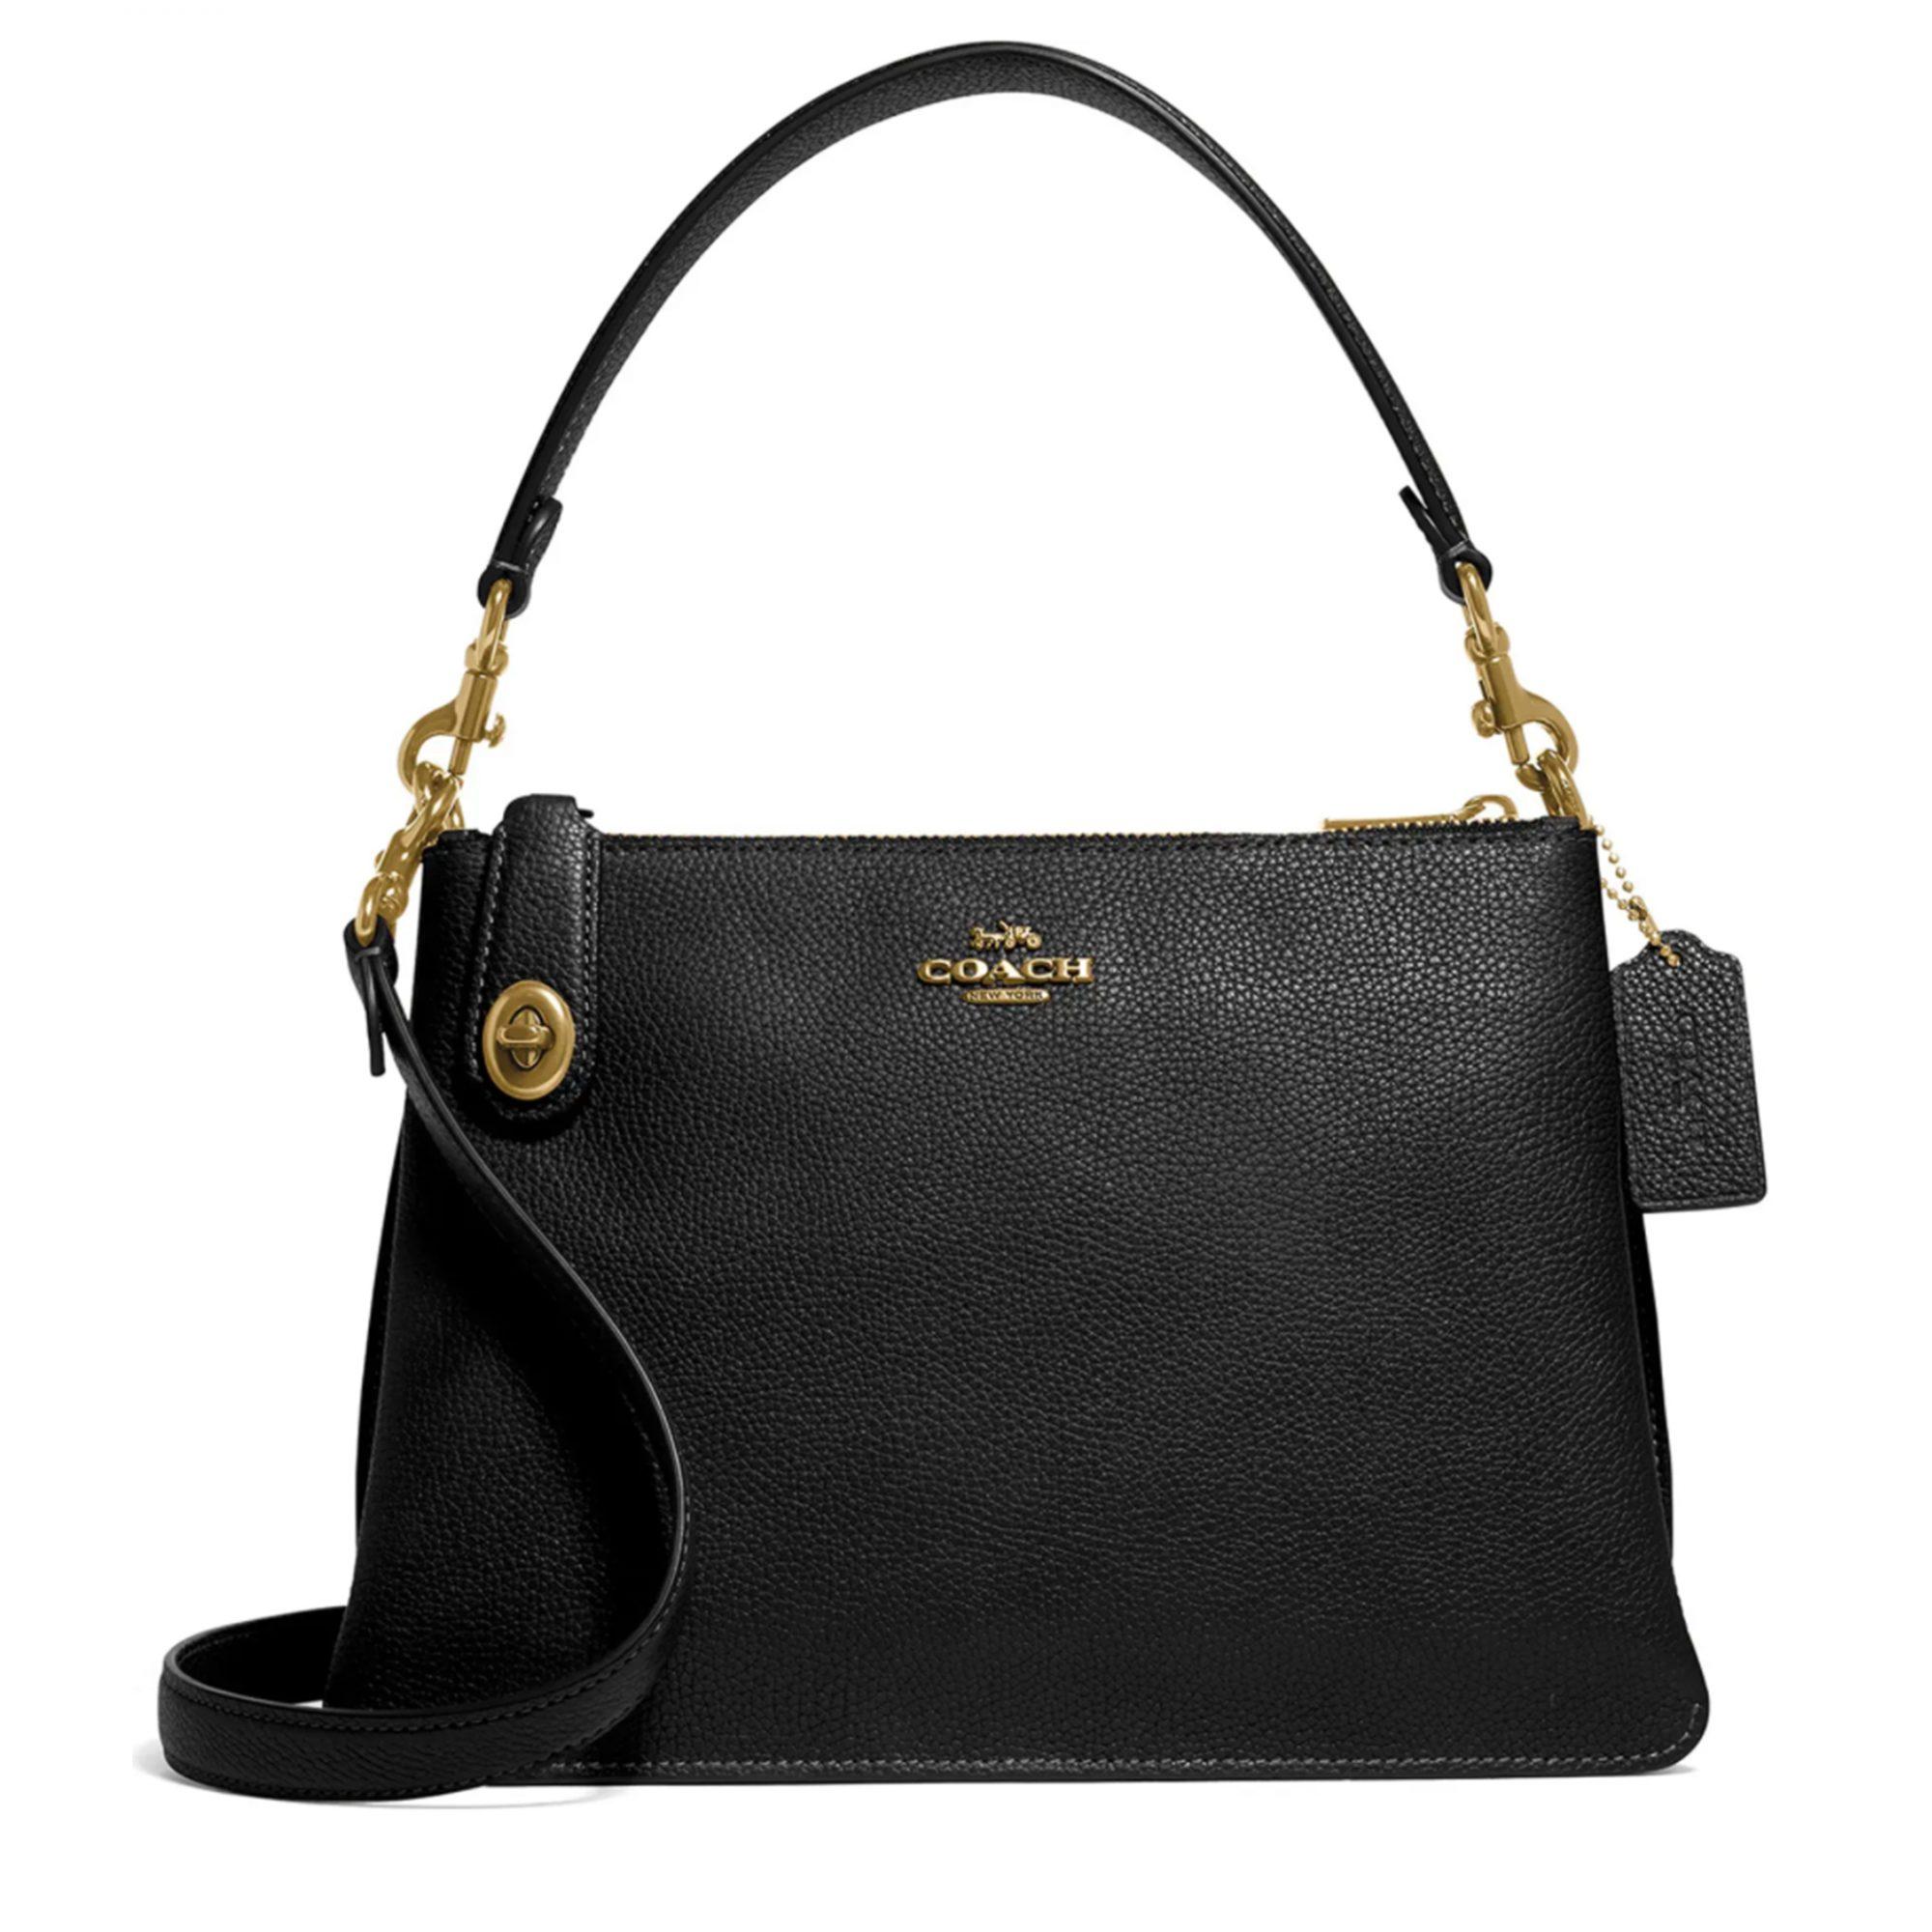 designer-handbags-nordstrom-anniversary-sale